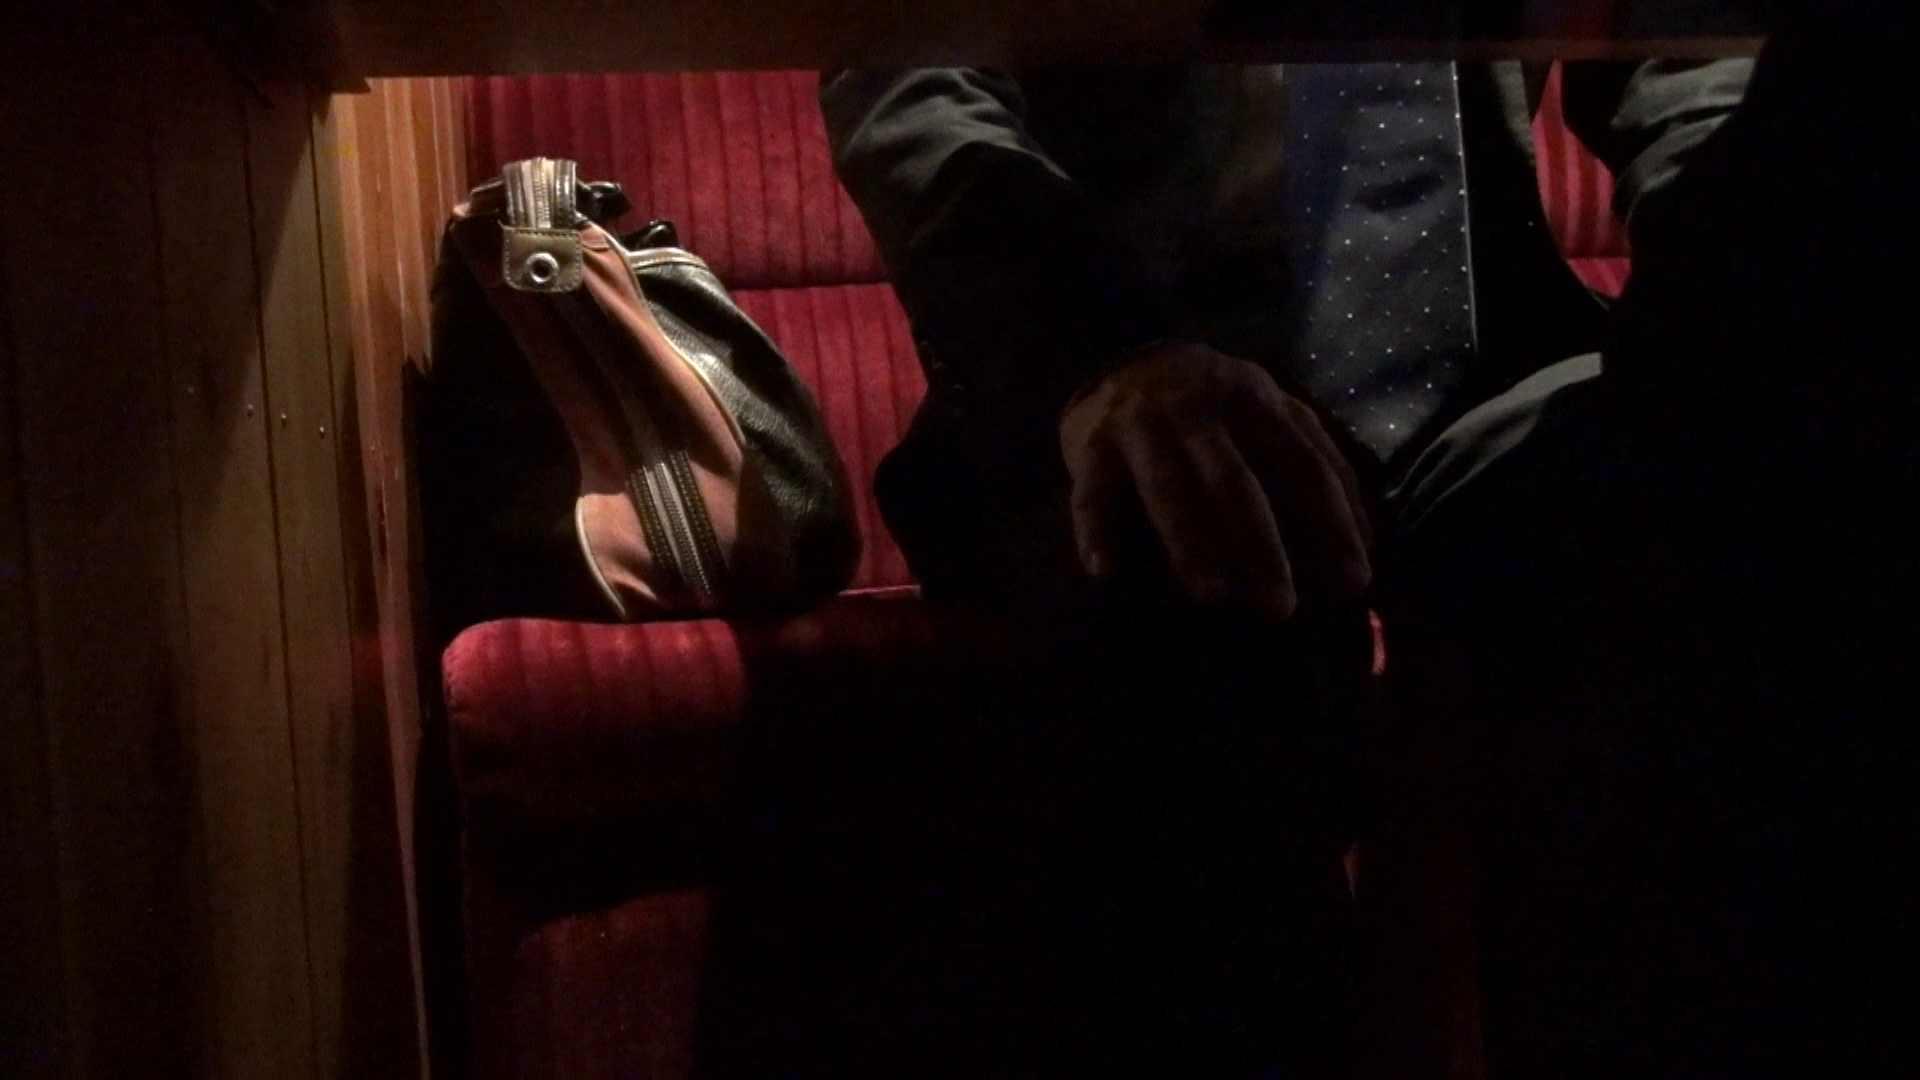 episode1 ヒロトさんと保険外交員との顔合わせ おまんこ無修正 オメコ動画キャプチャ 71pic 19